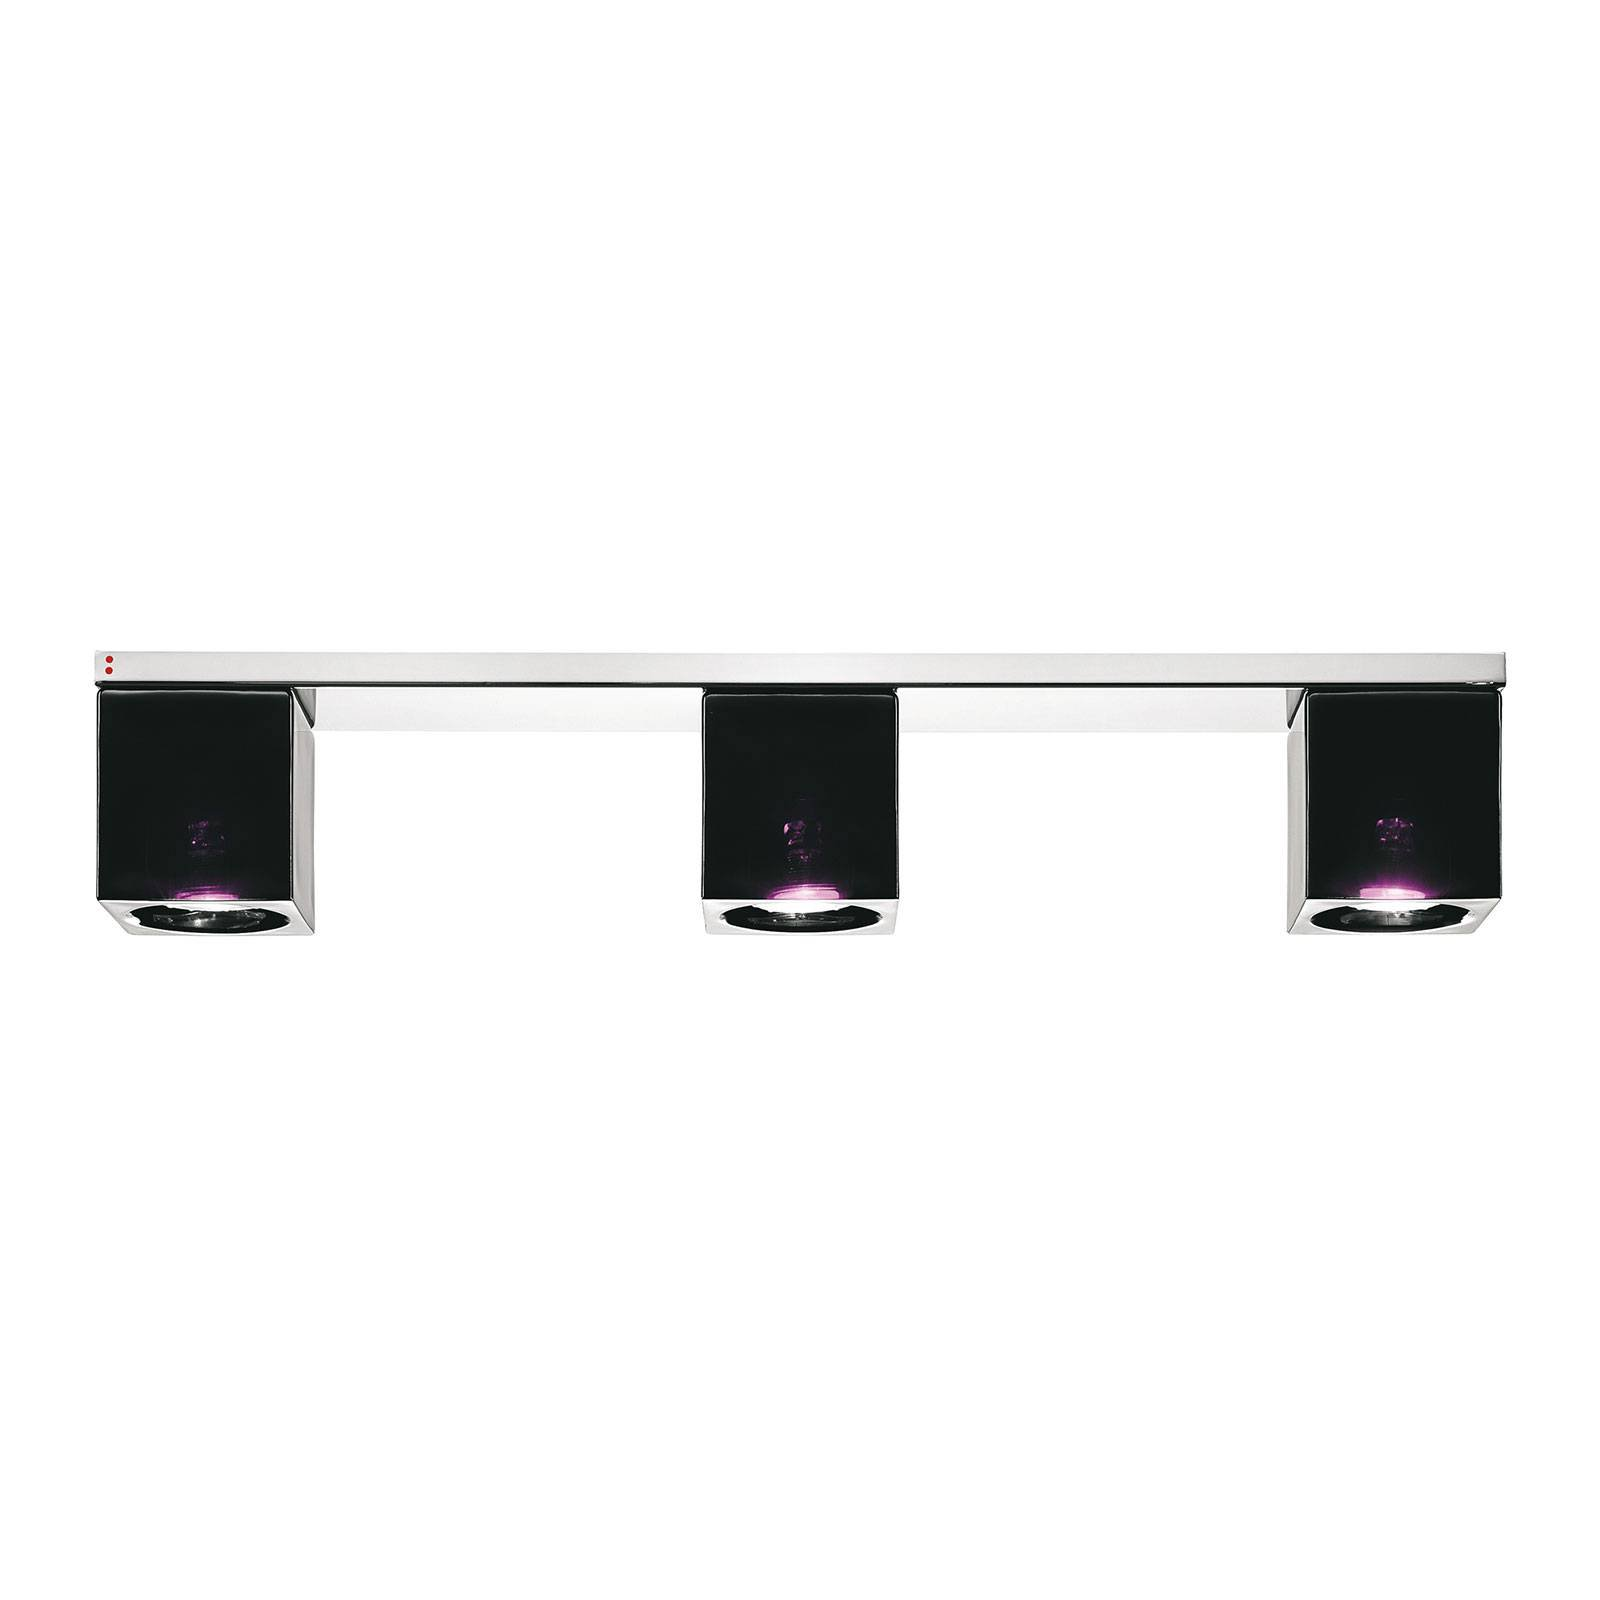 Fabbian Cubetto taklampe 3 lyskilder GU10 svart